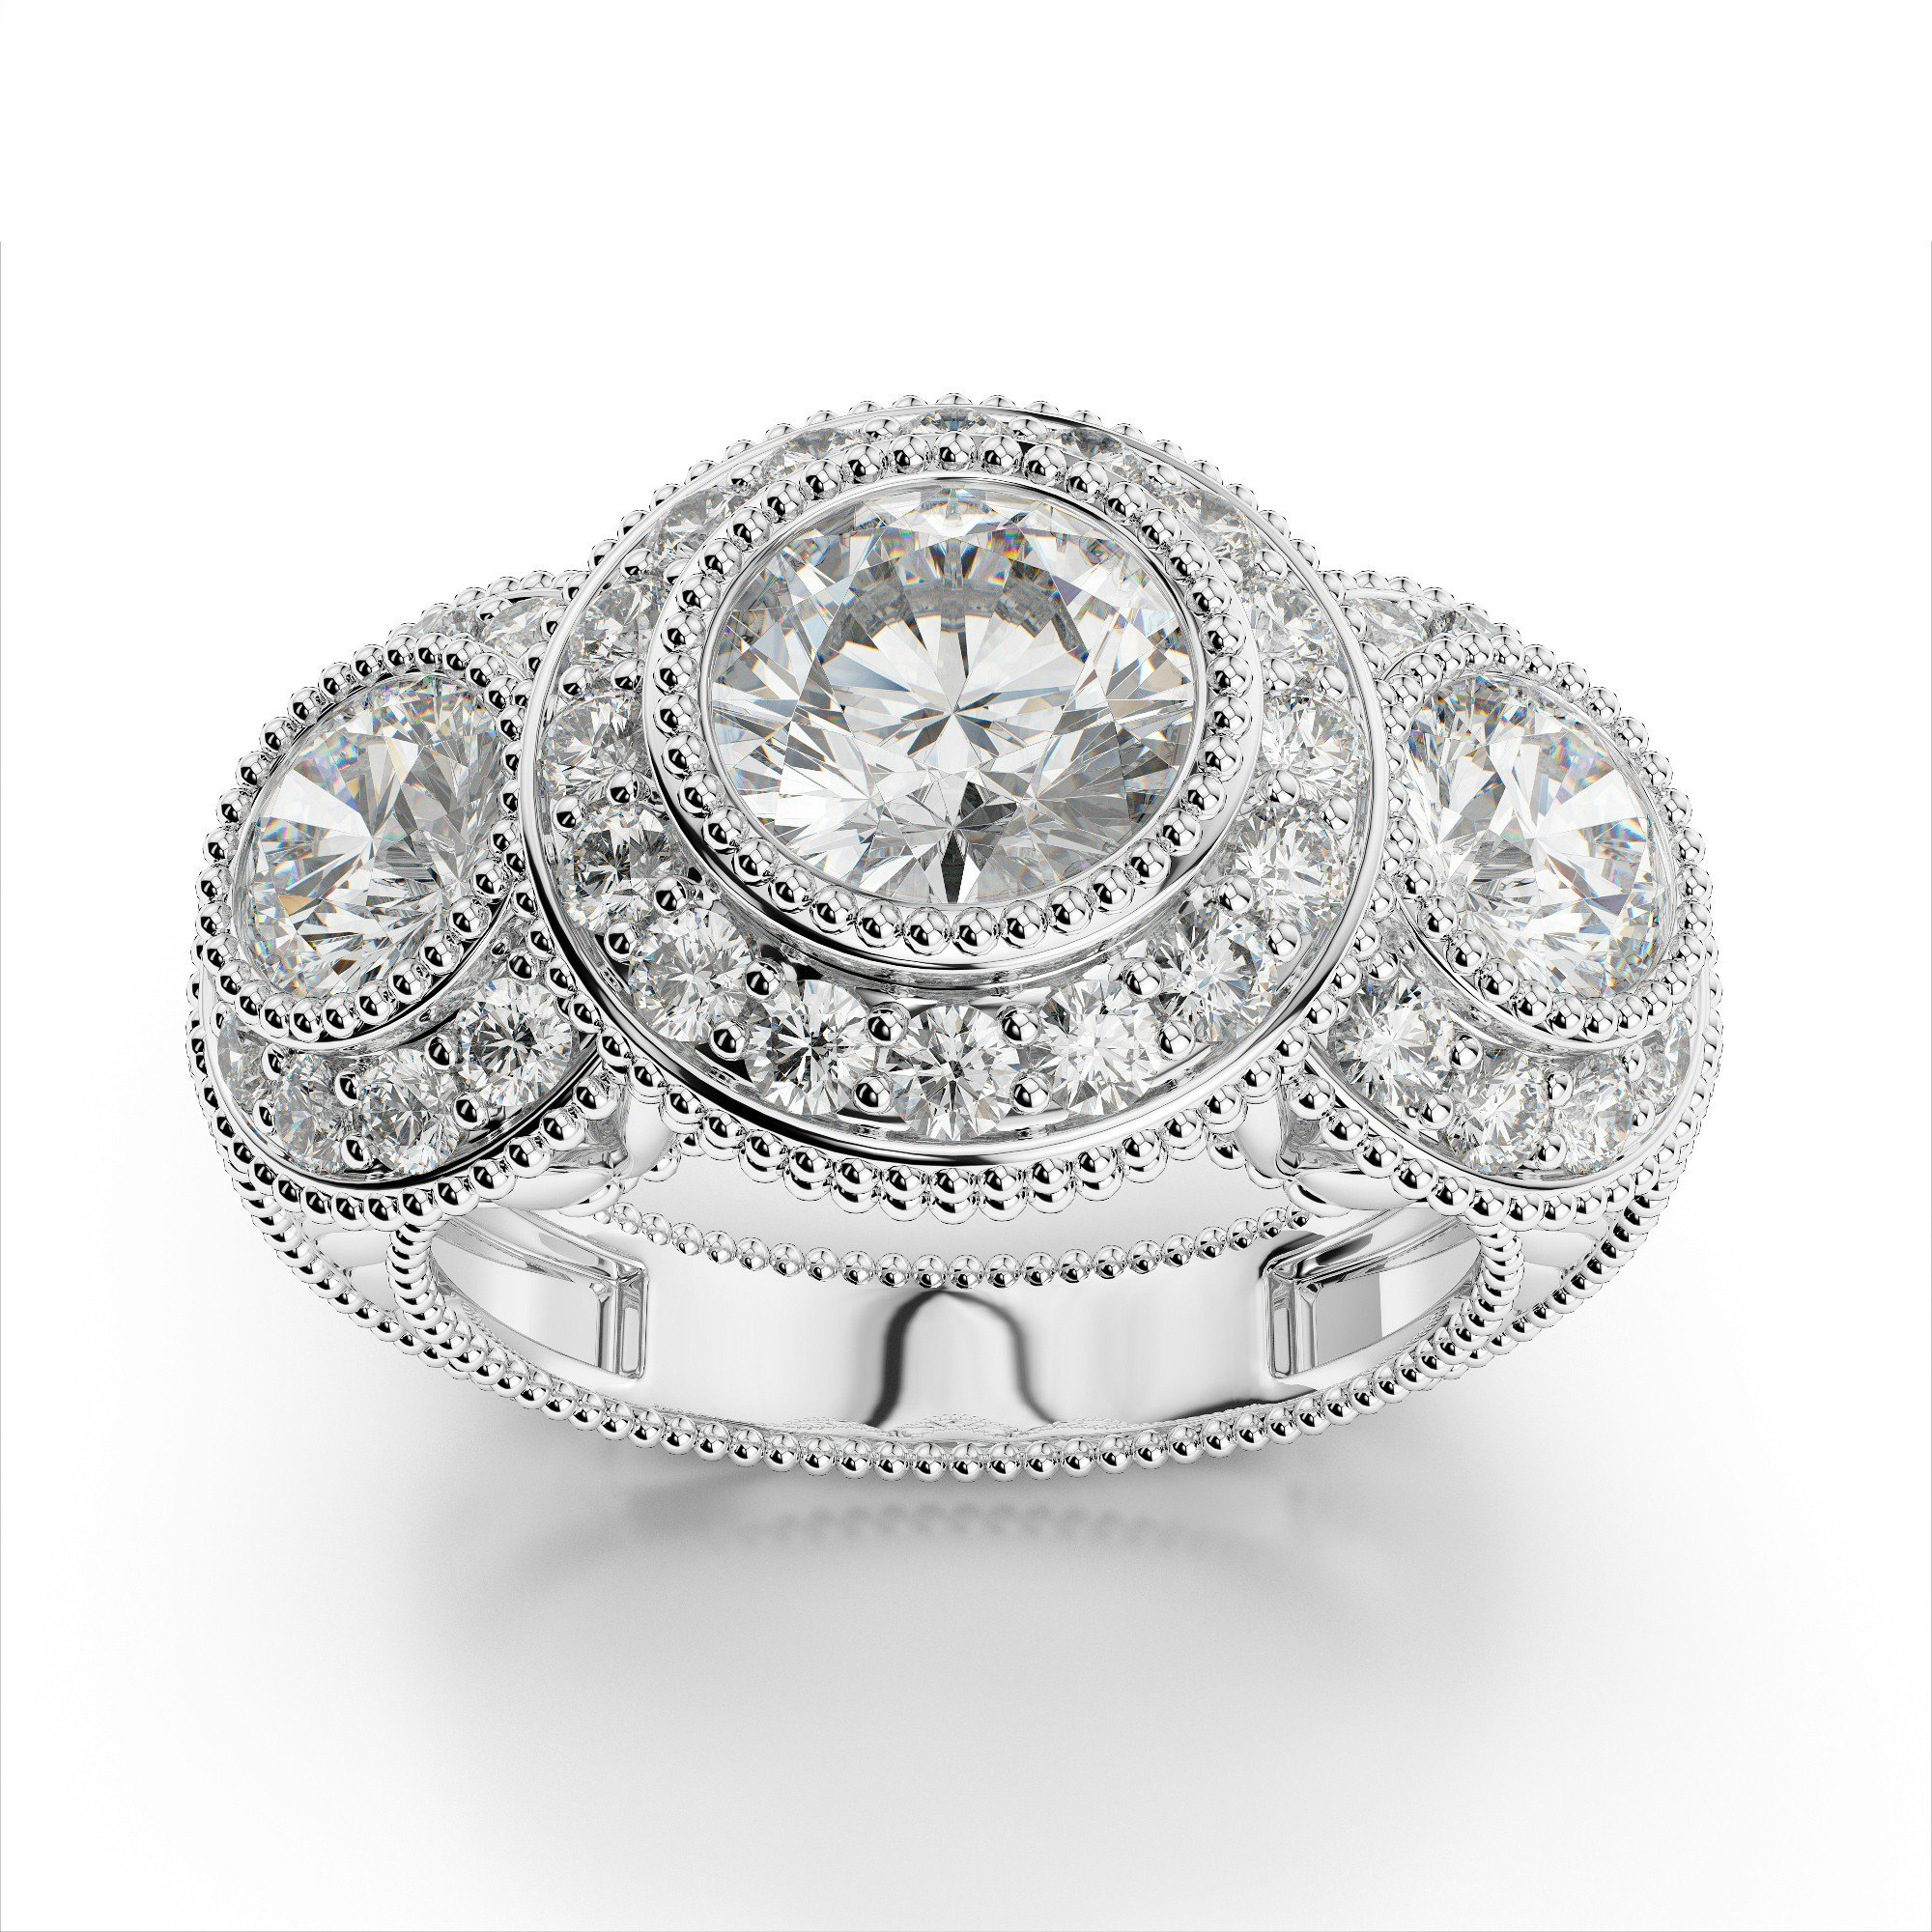 1 Carat Round Diamond Three Stone Halo Engagement Ring